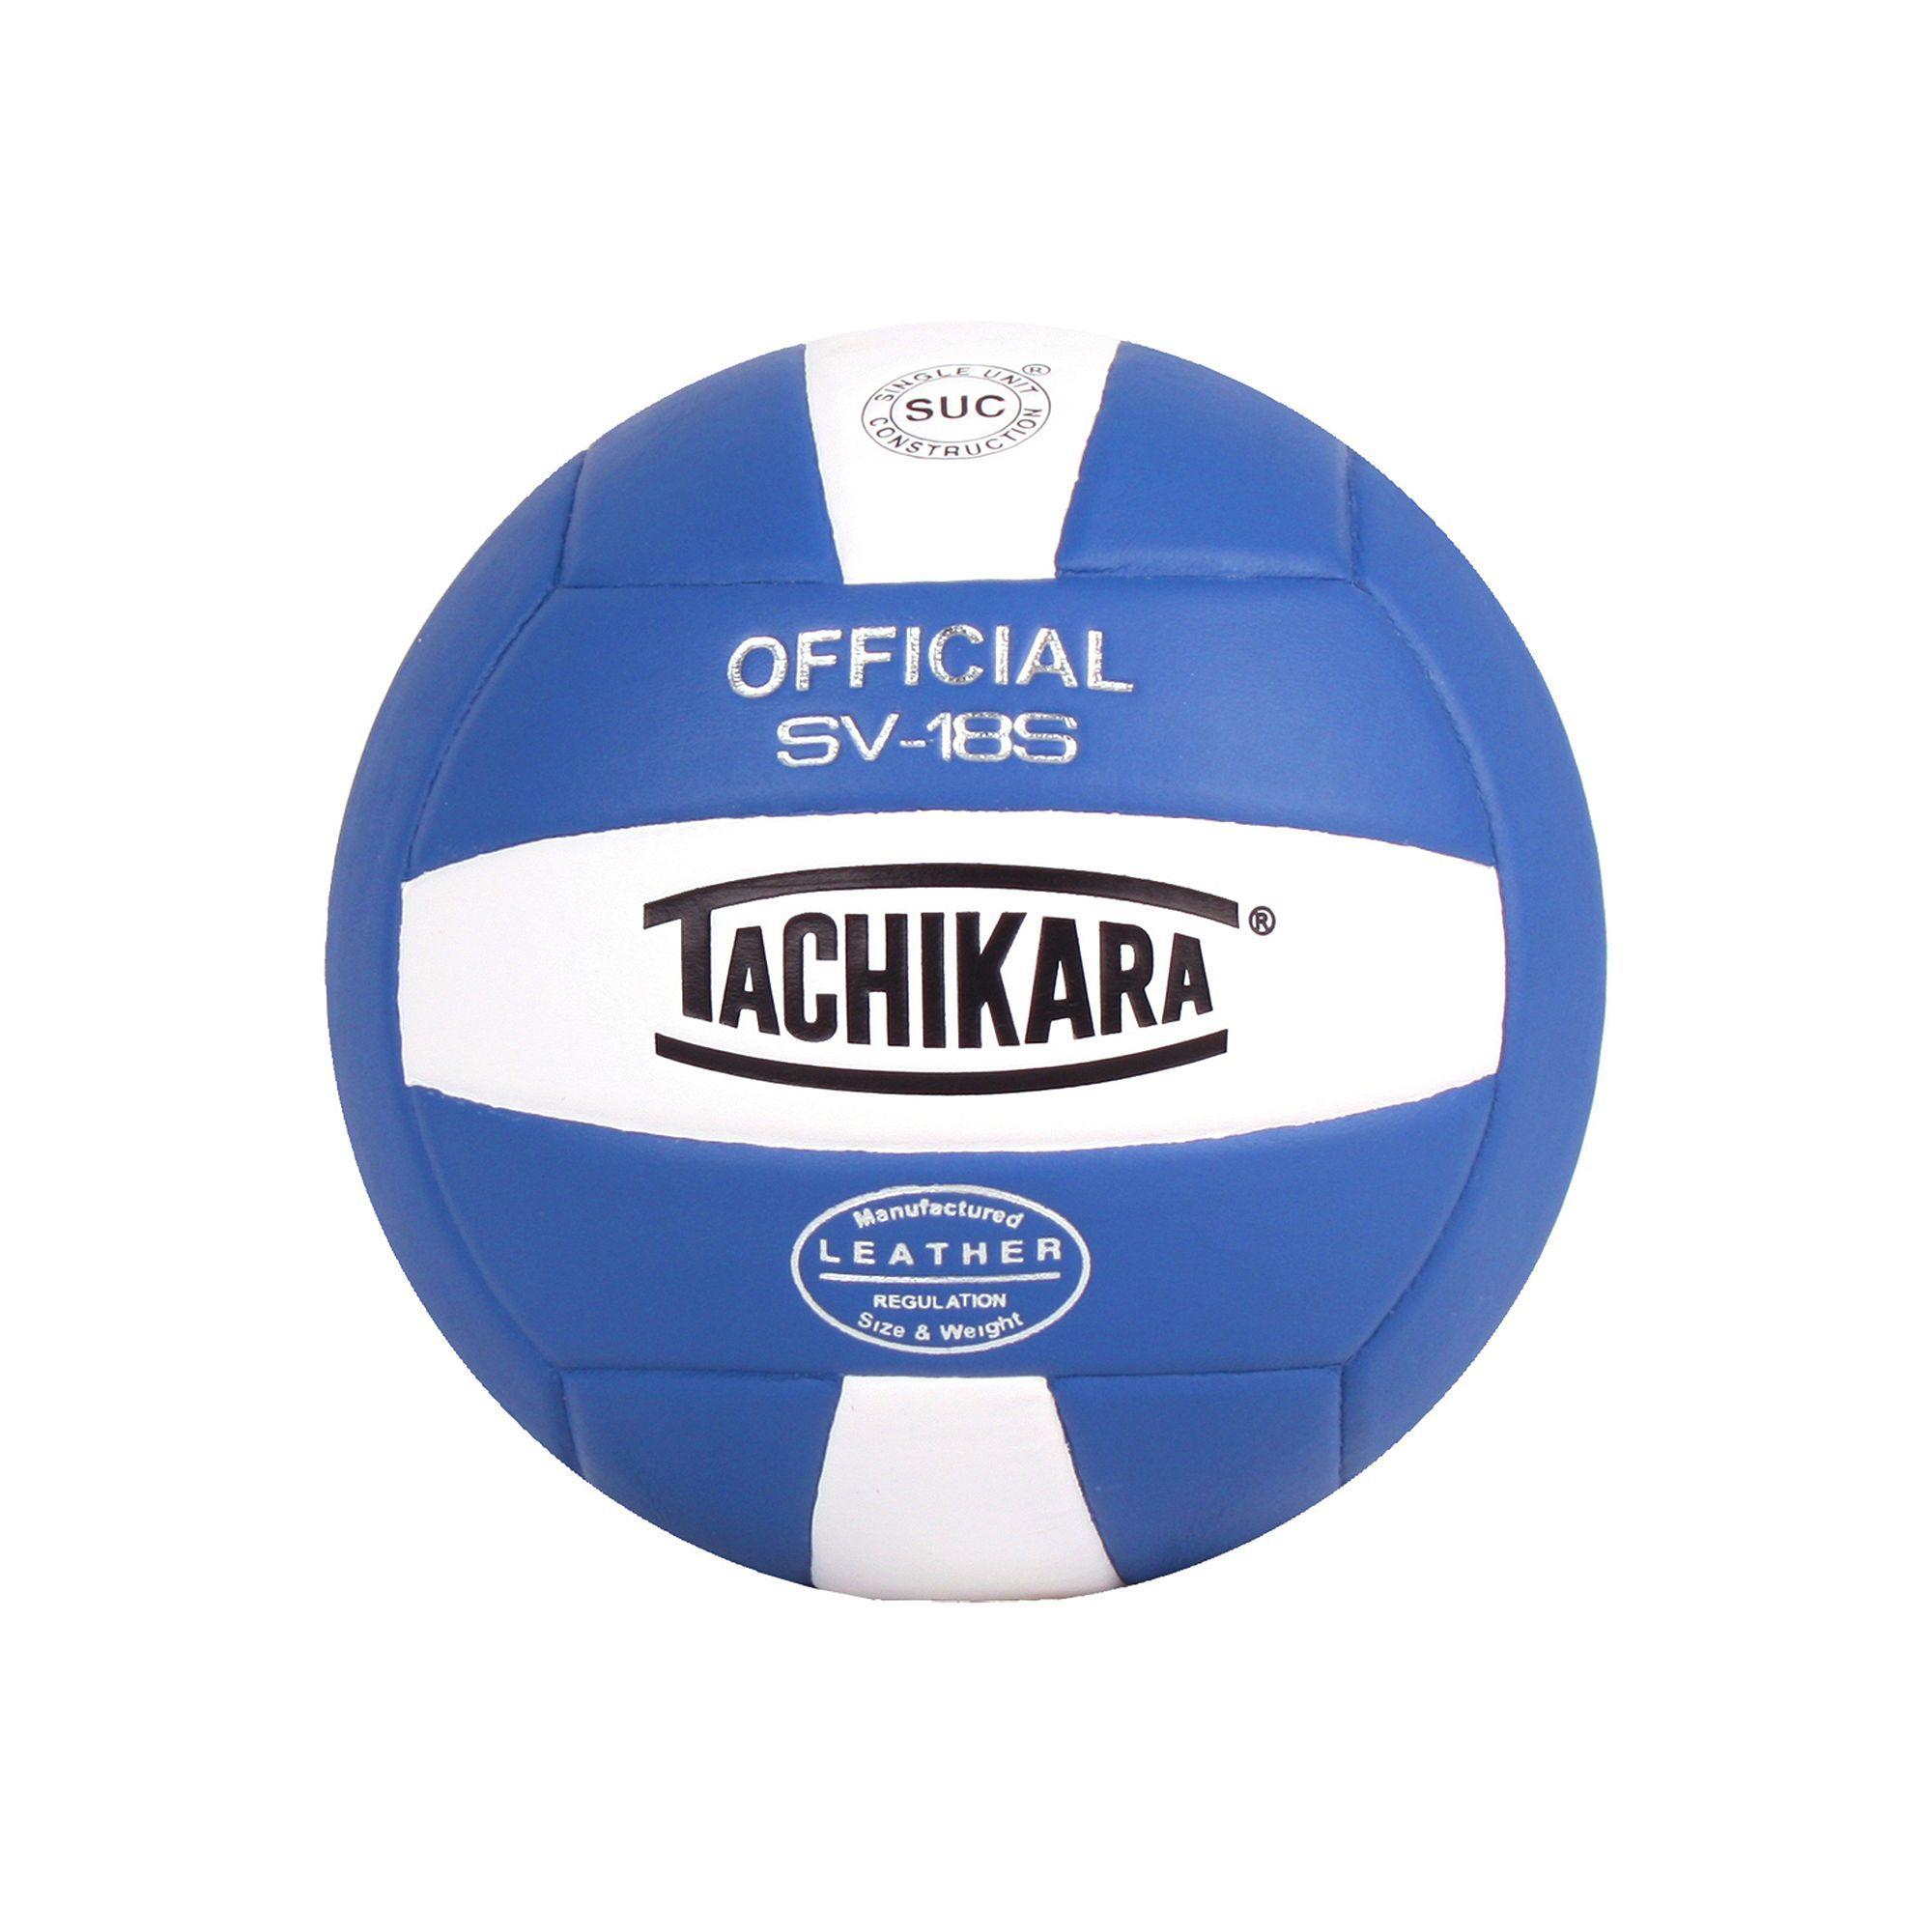 Tachikara Official Sv18s Composite Leather Volleyball Blue Indoor Volleyball Volleyballs Volleyball